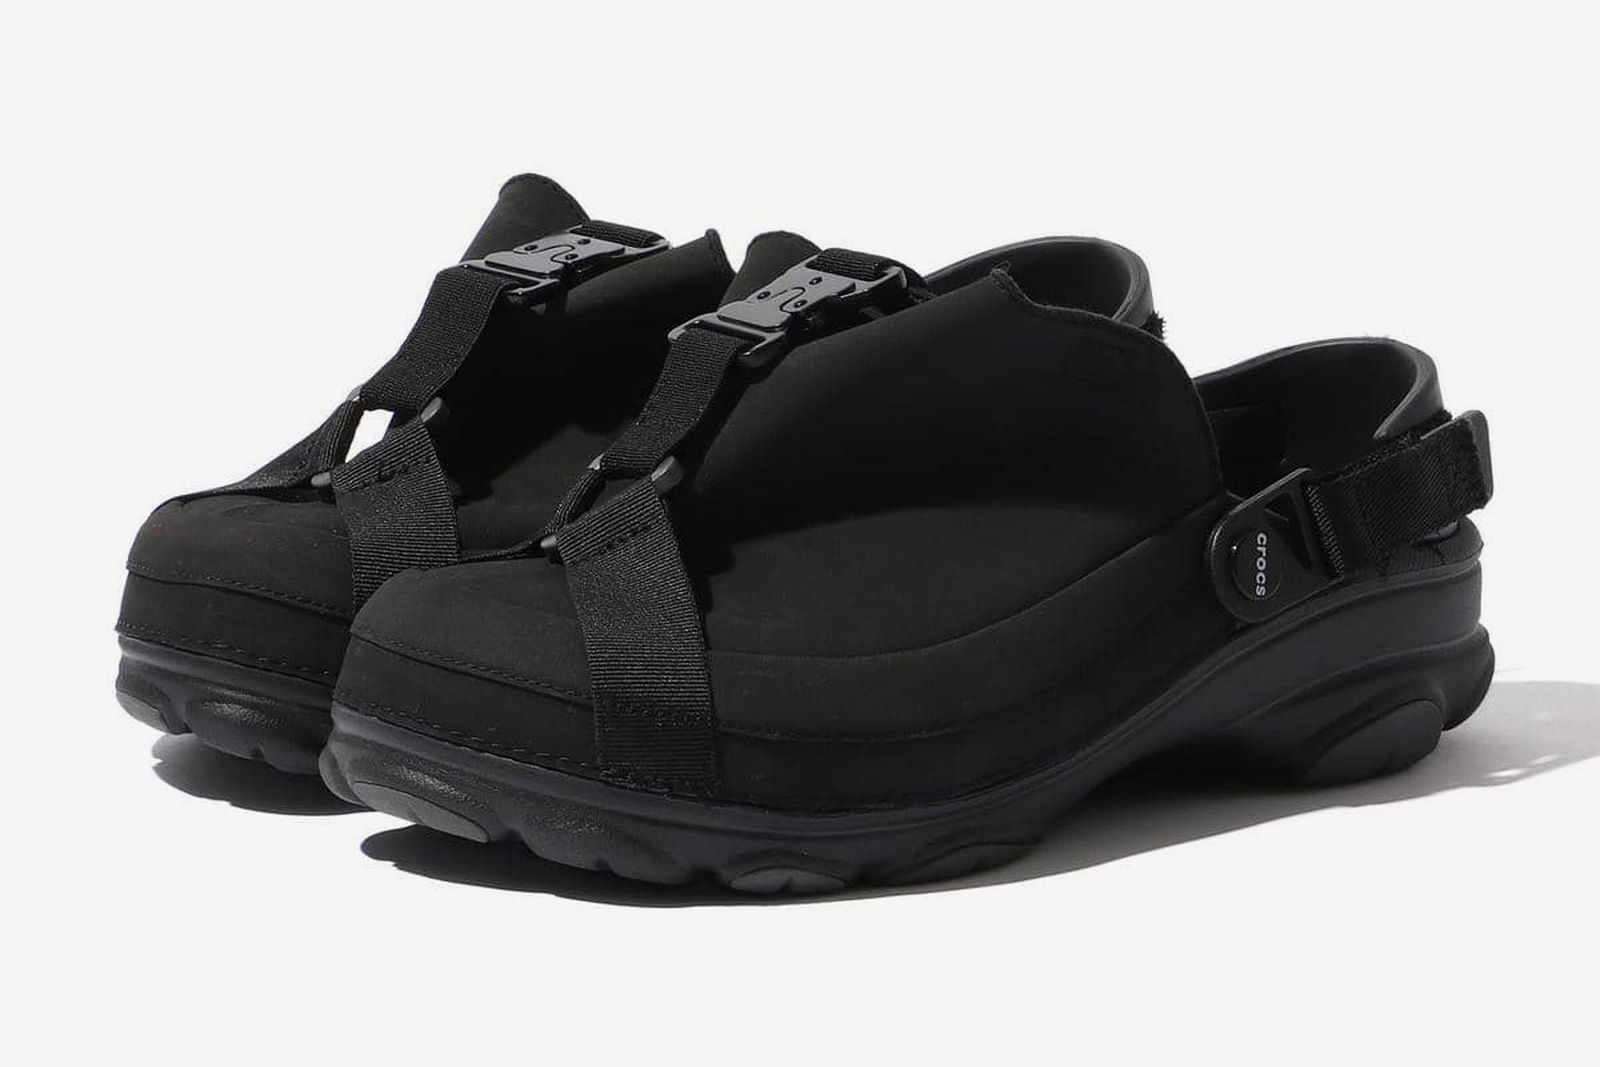 beams-crocs-spring-2020-release-date-price-1-01